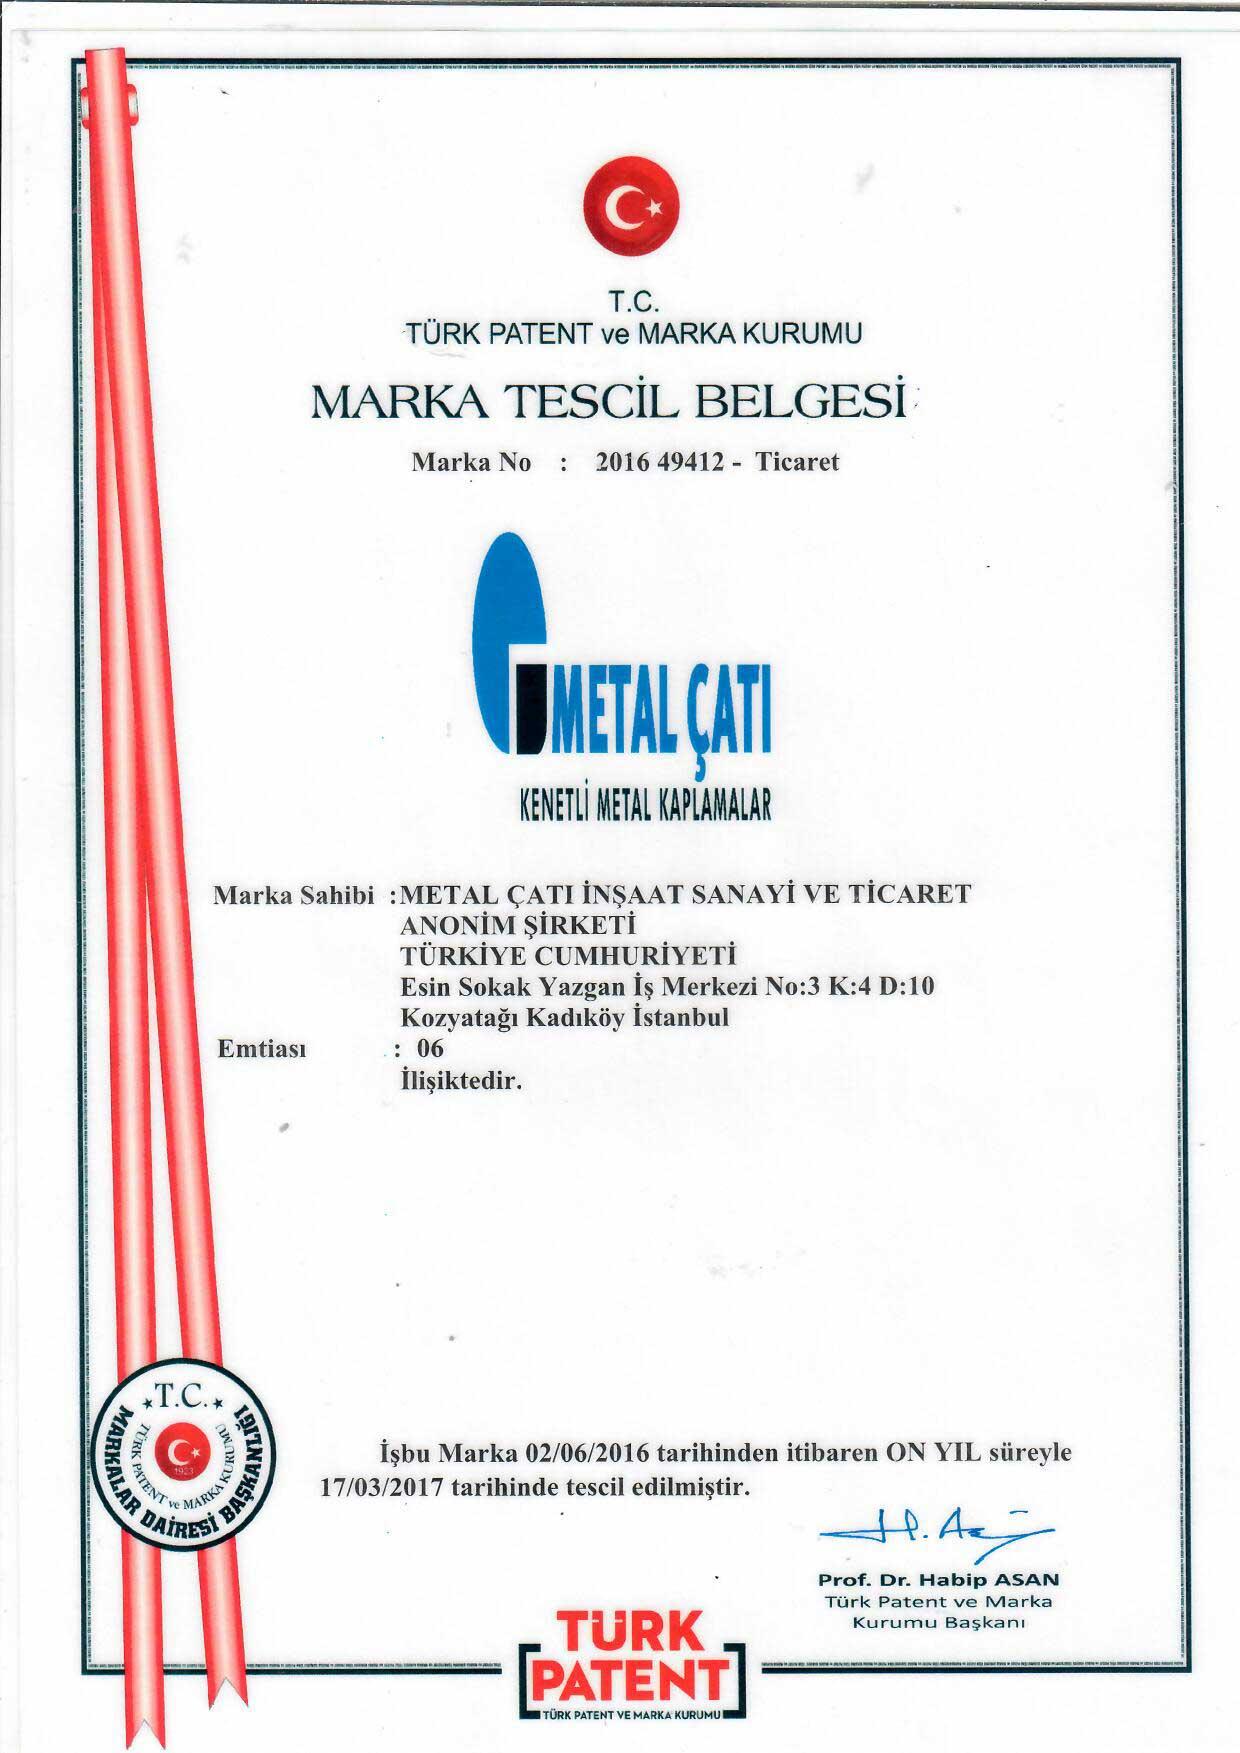 Metal Çatı - Marka Tescili